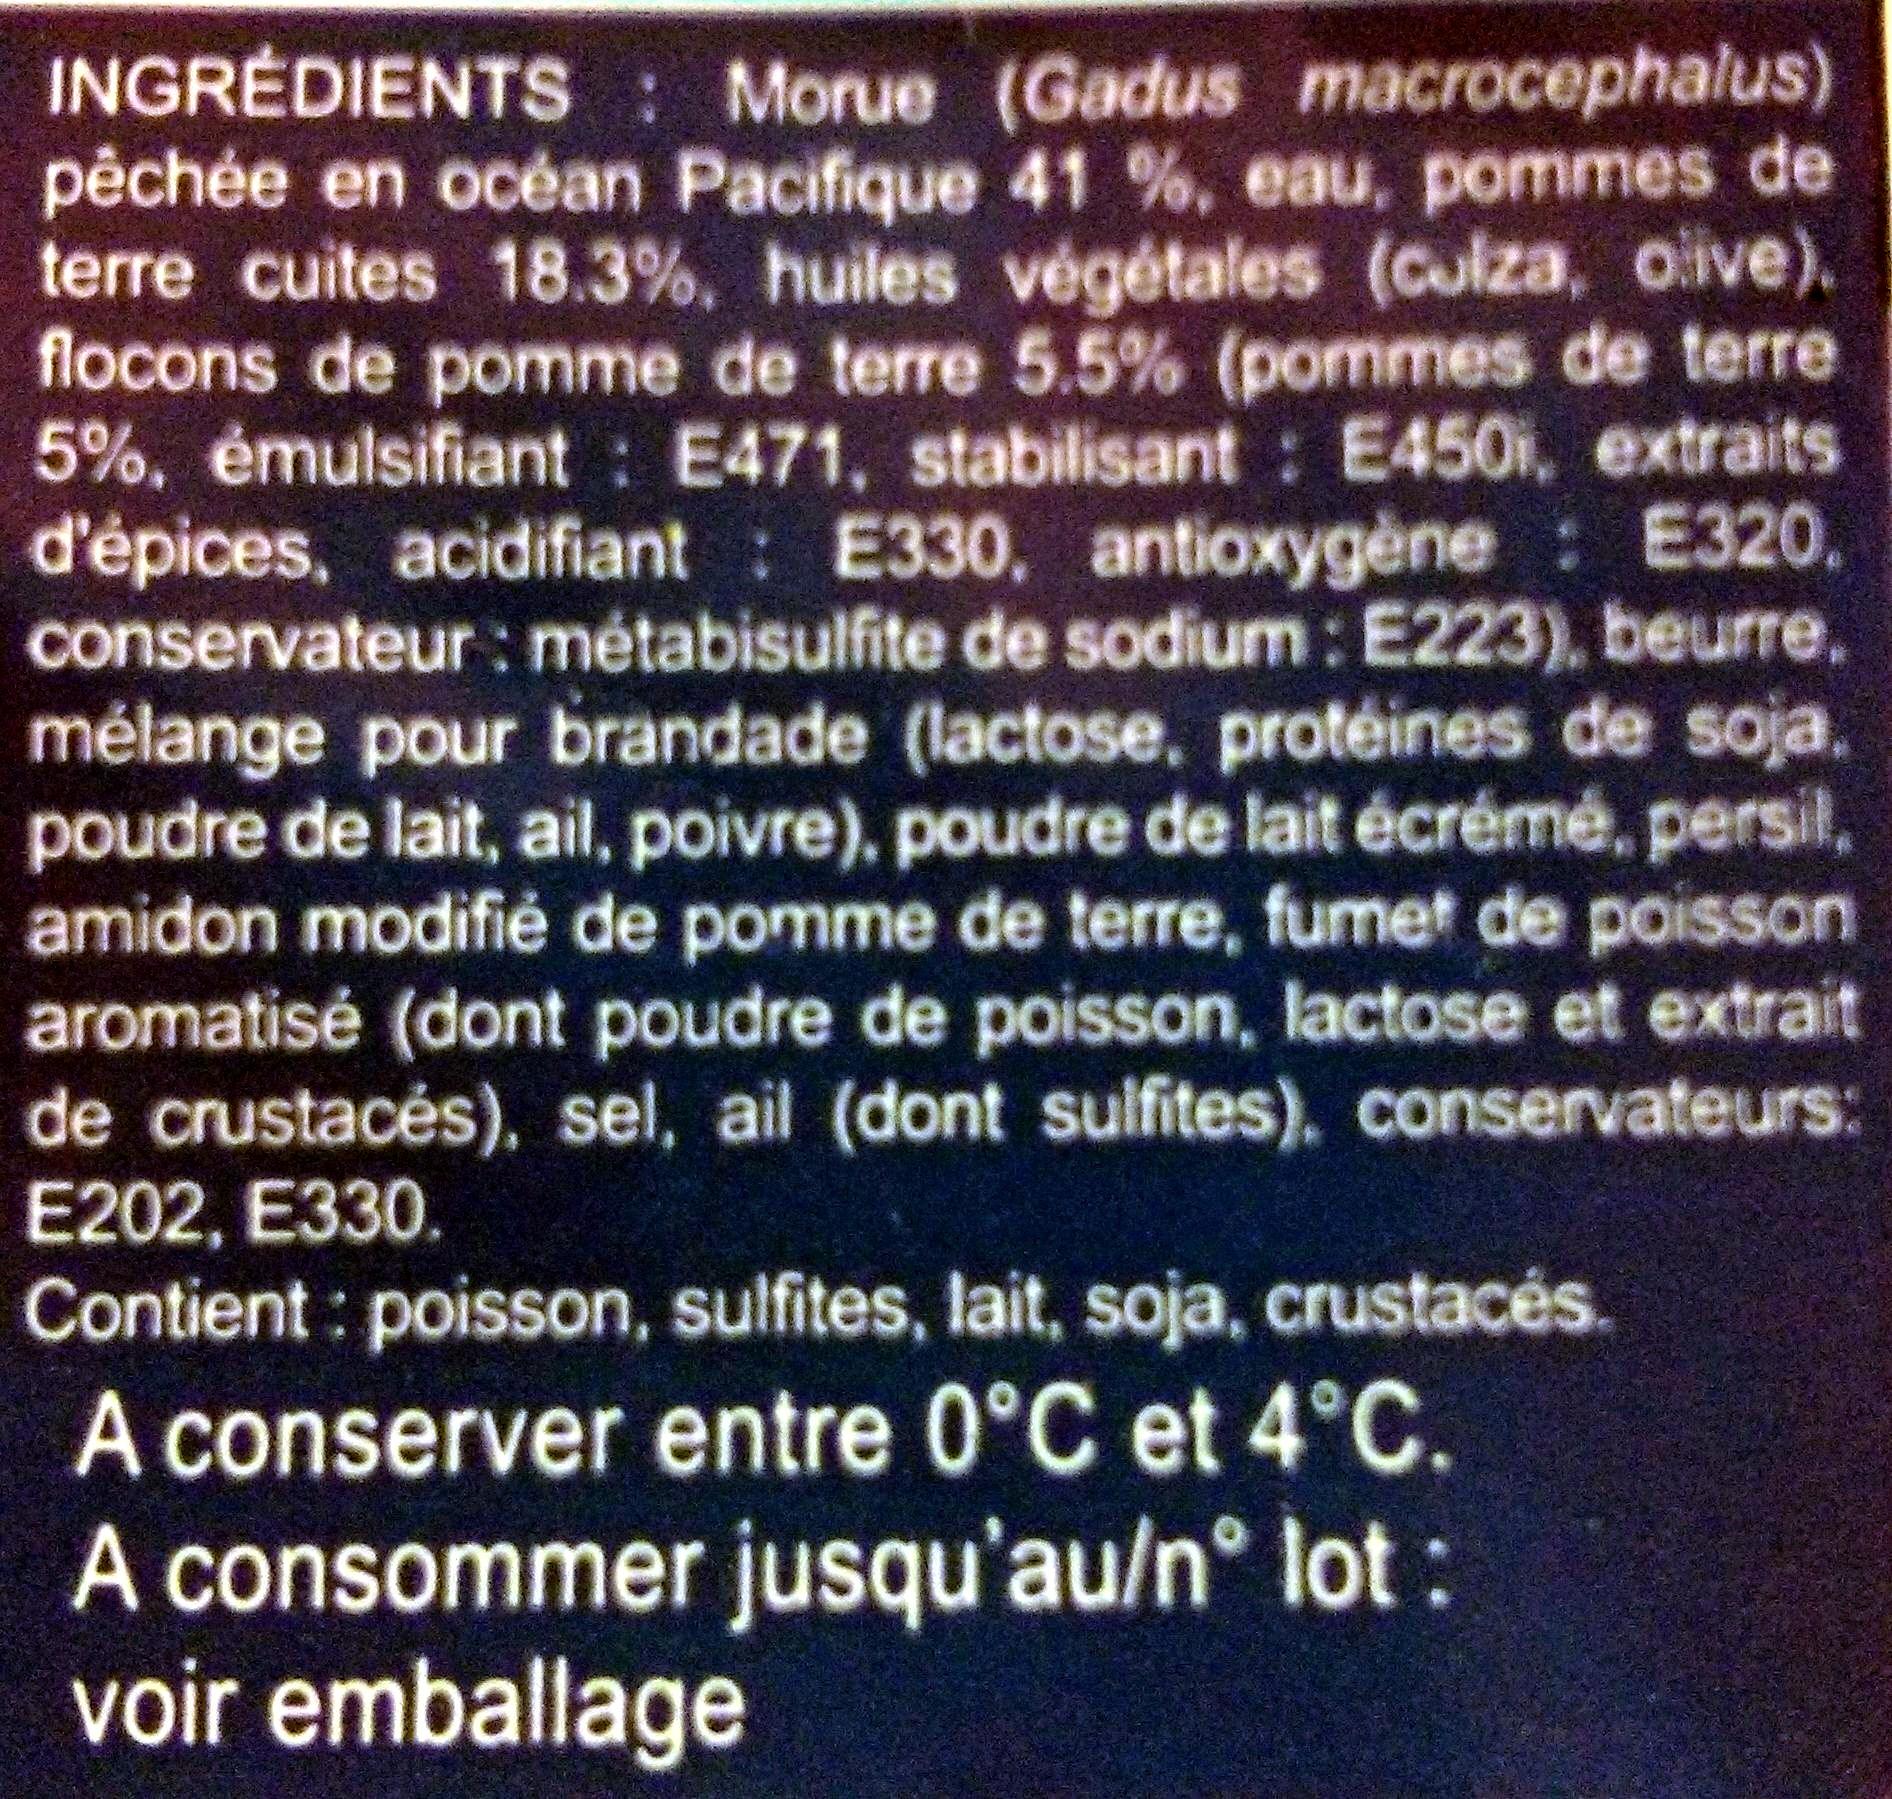 Brandade de Morue Parmentière - Ingredients